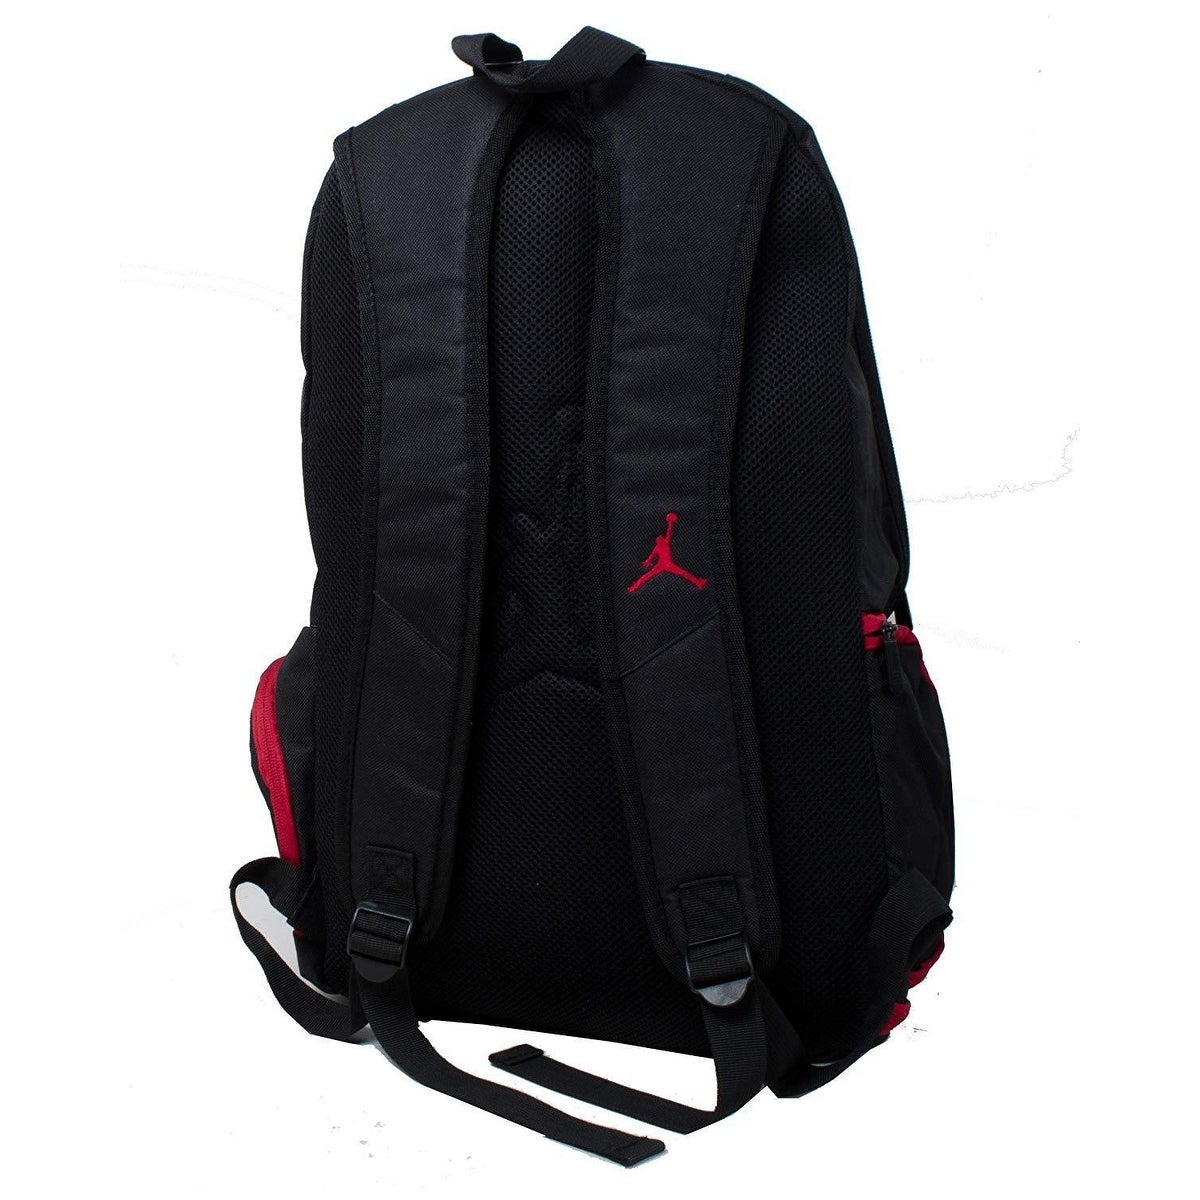 d6f083b63b20 Shop Nike Jordan Jumpman 23 Grid 2-Strap School Backpack 9A1137 - Free  Shipping On Orders Over  45 - Overstock - 22544883